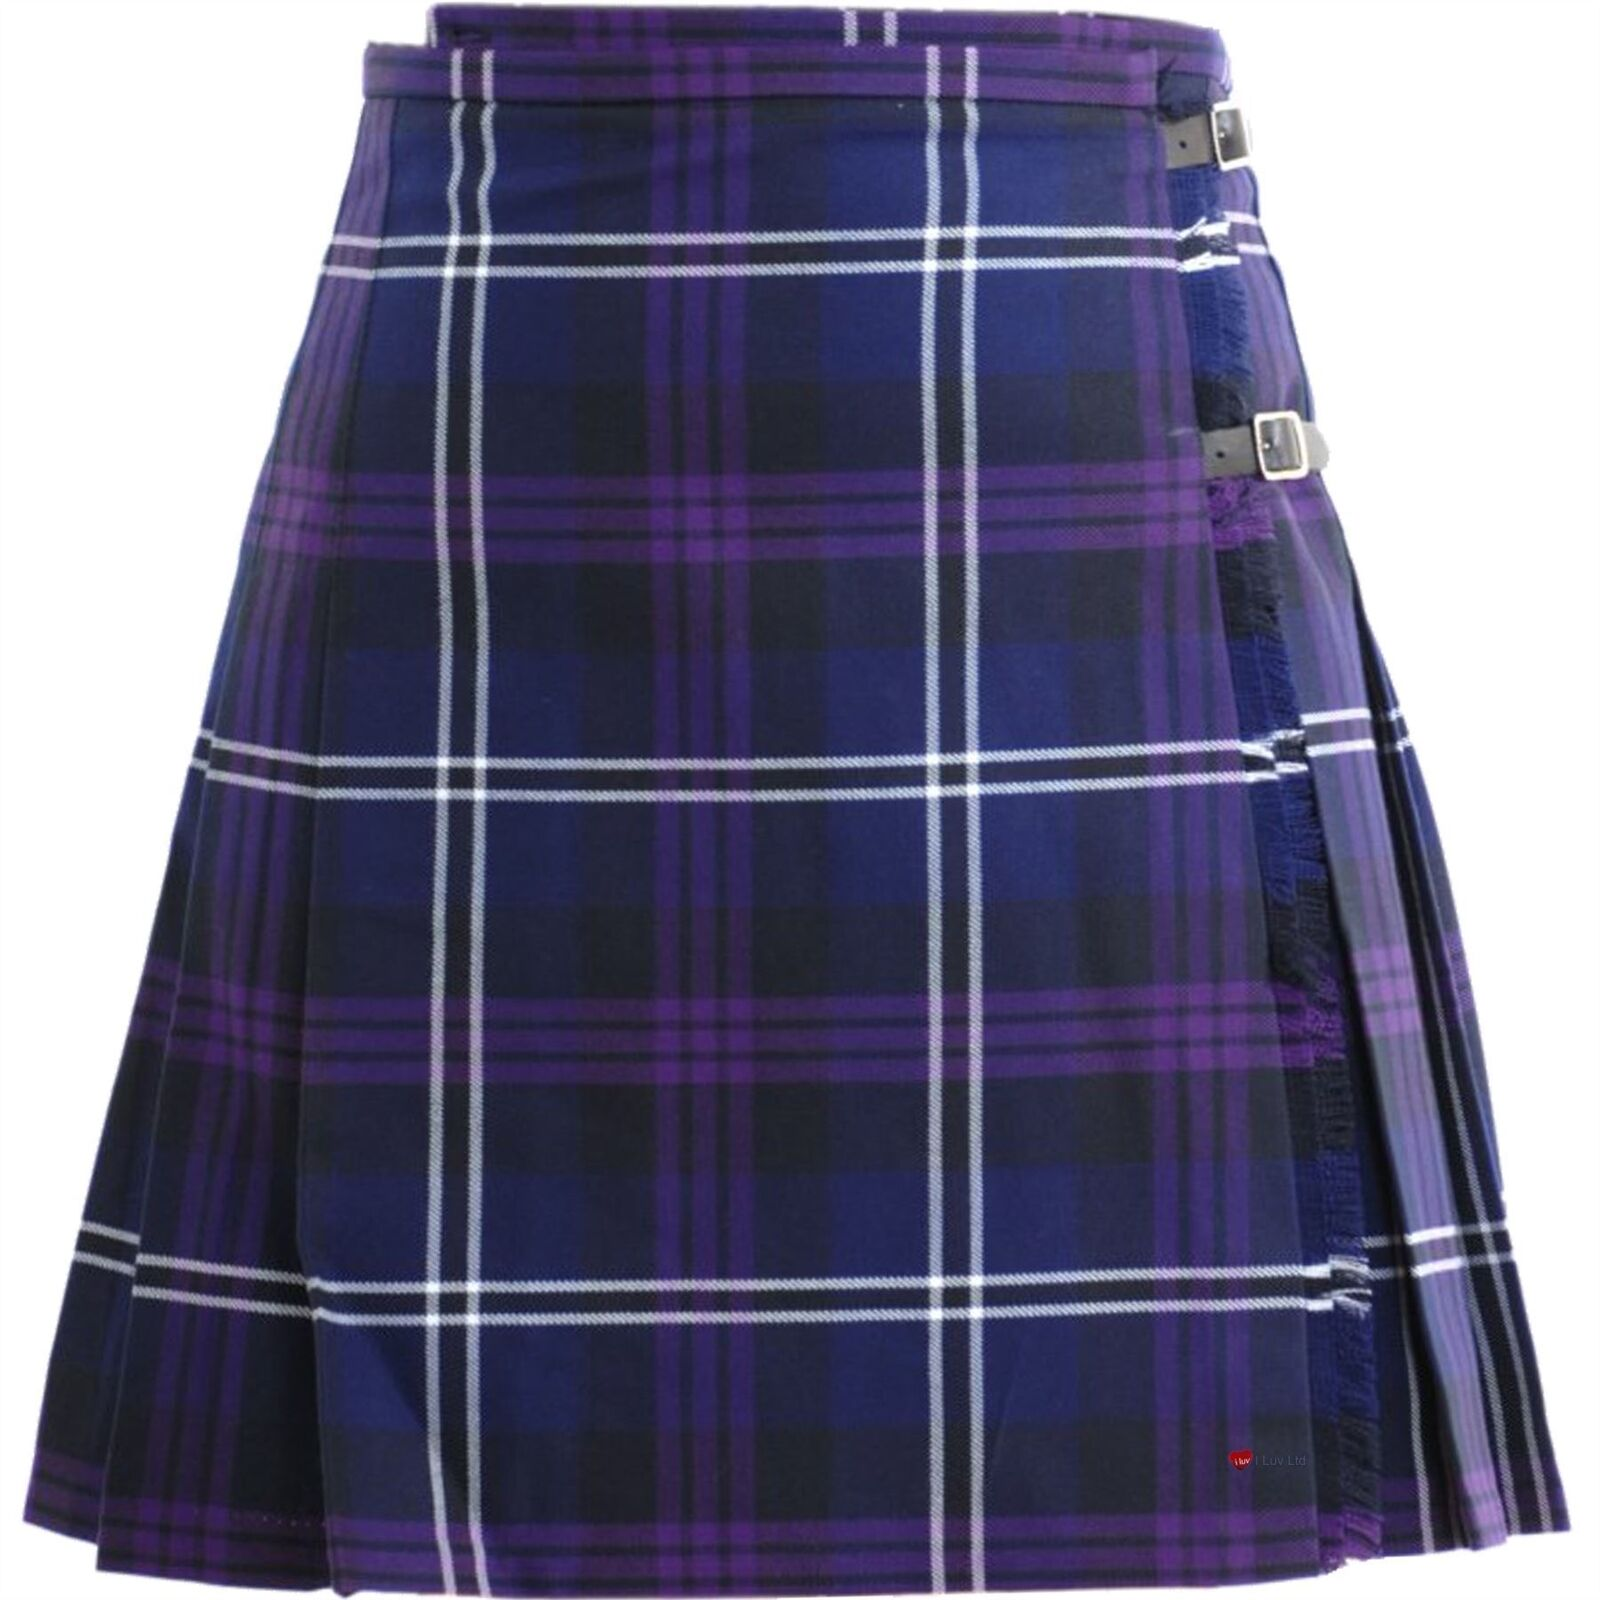 Ladies Deluxe Mini Skirt Kilt Heritage of Scotland Tartan